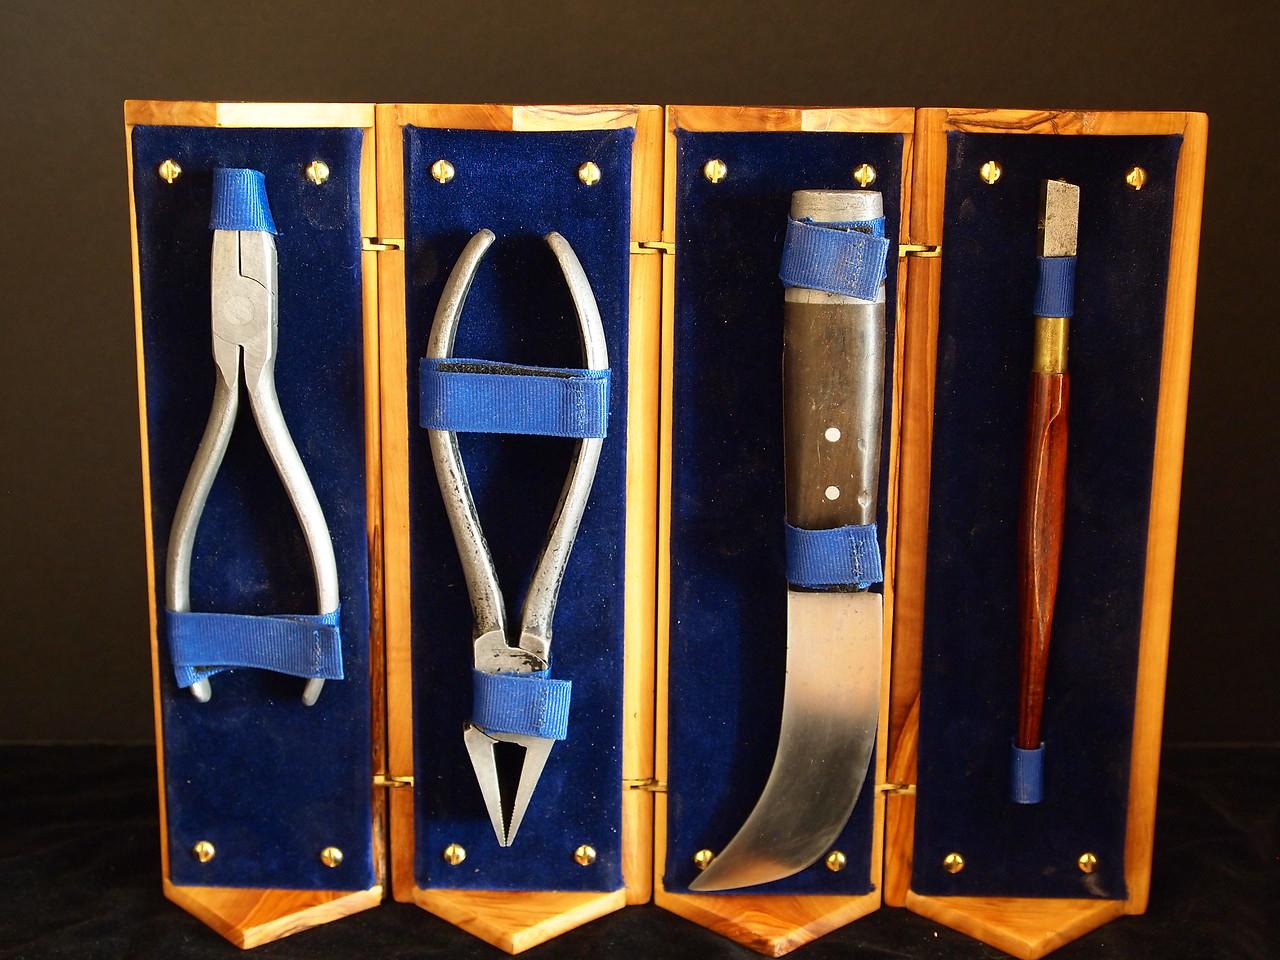 Grozing pliers, breaking pliers, lead knife and glass cutter